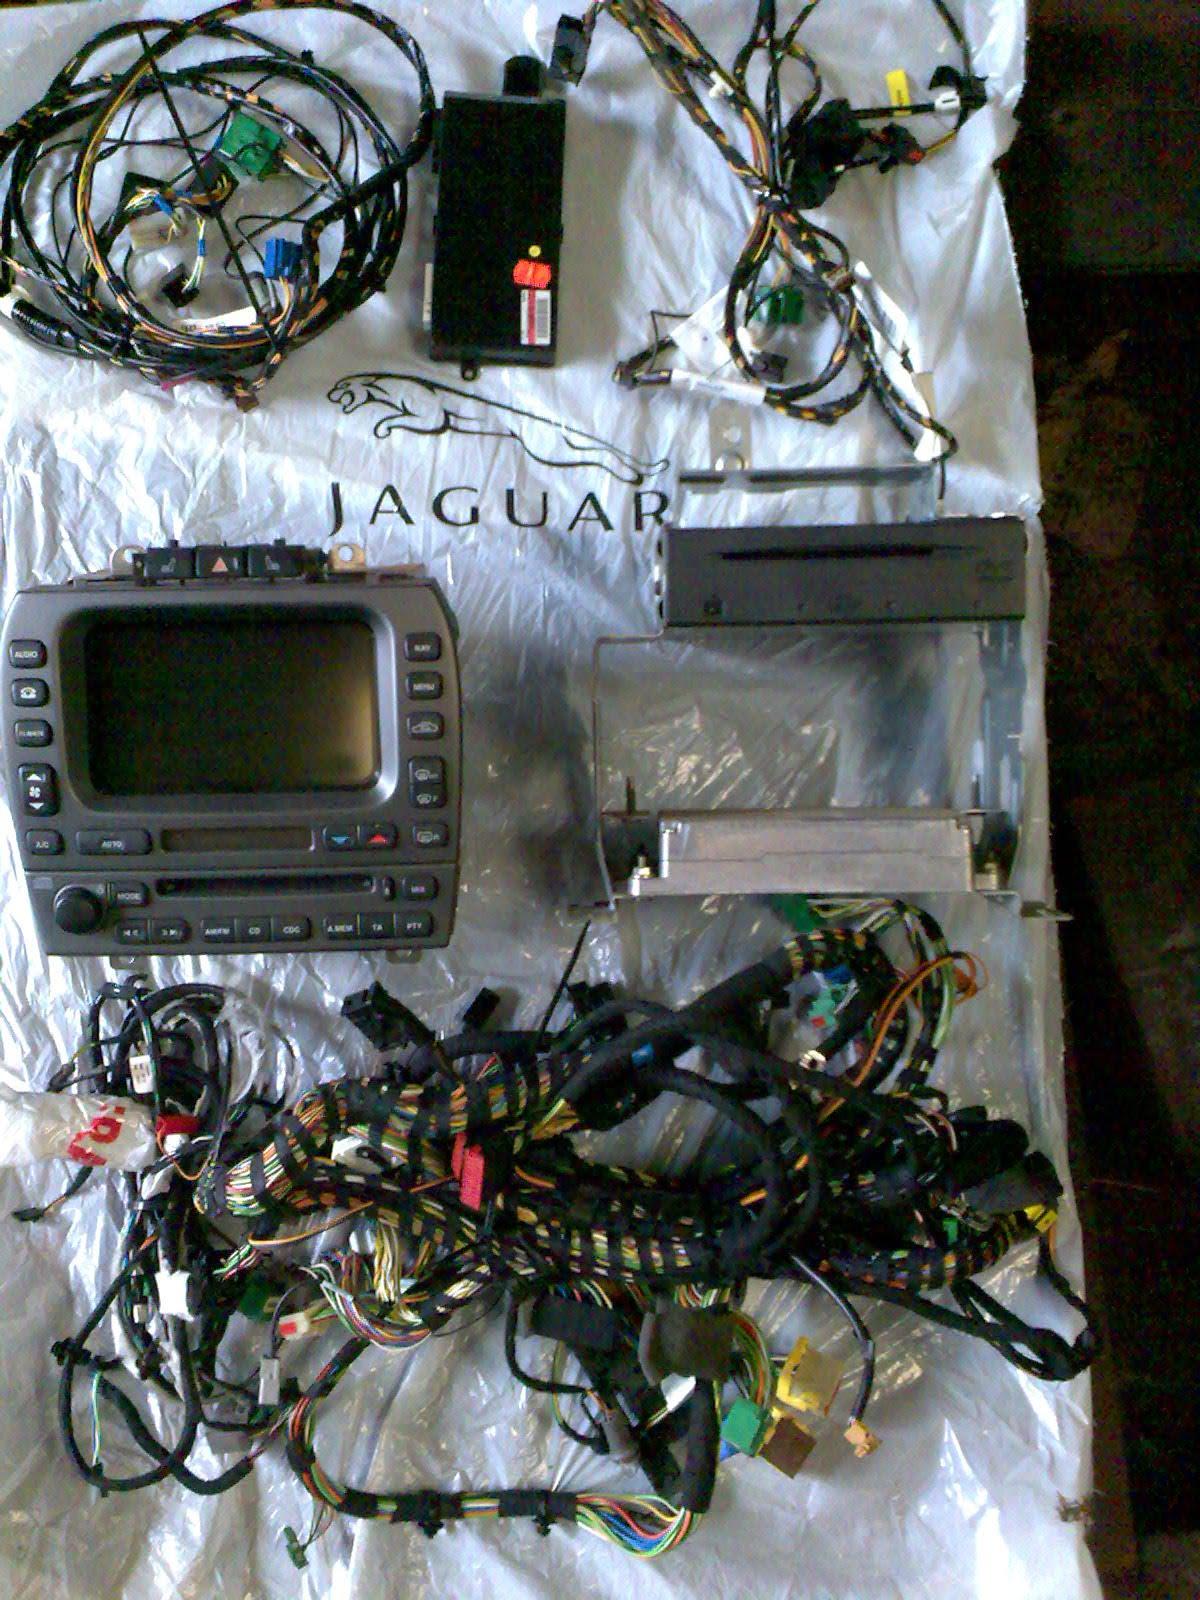 sat nav phone kit?height=320&width=240 radio sat nav b12jags jaguar x type sat nav wiring diagram at bayanpartner.co